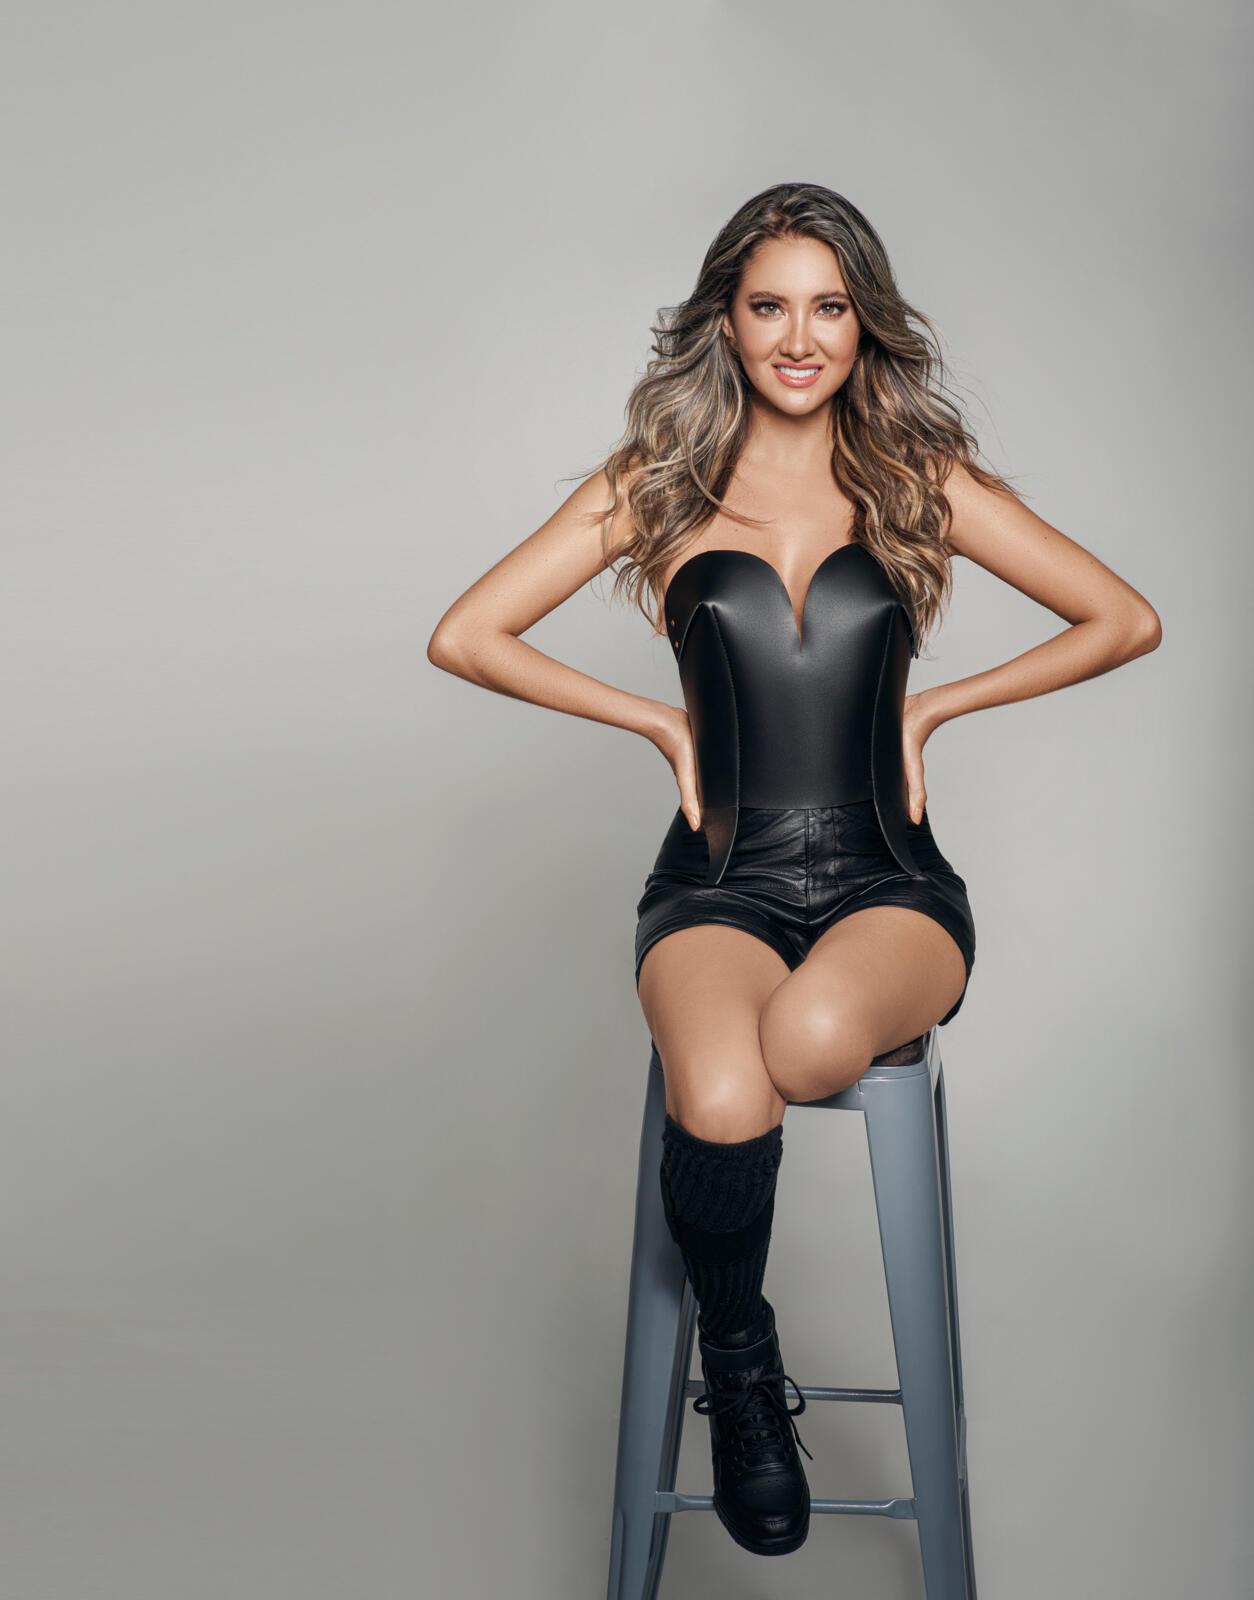 Daniella Alvarez - DO NOT REUSE